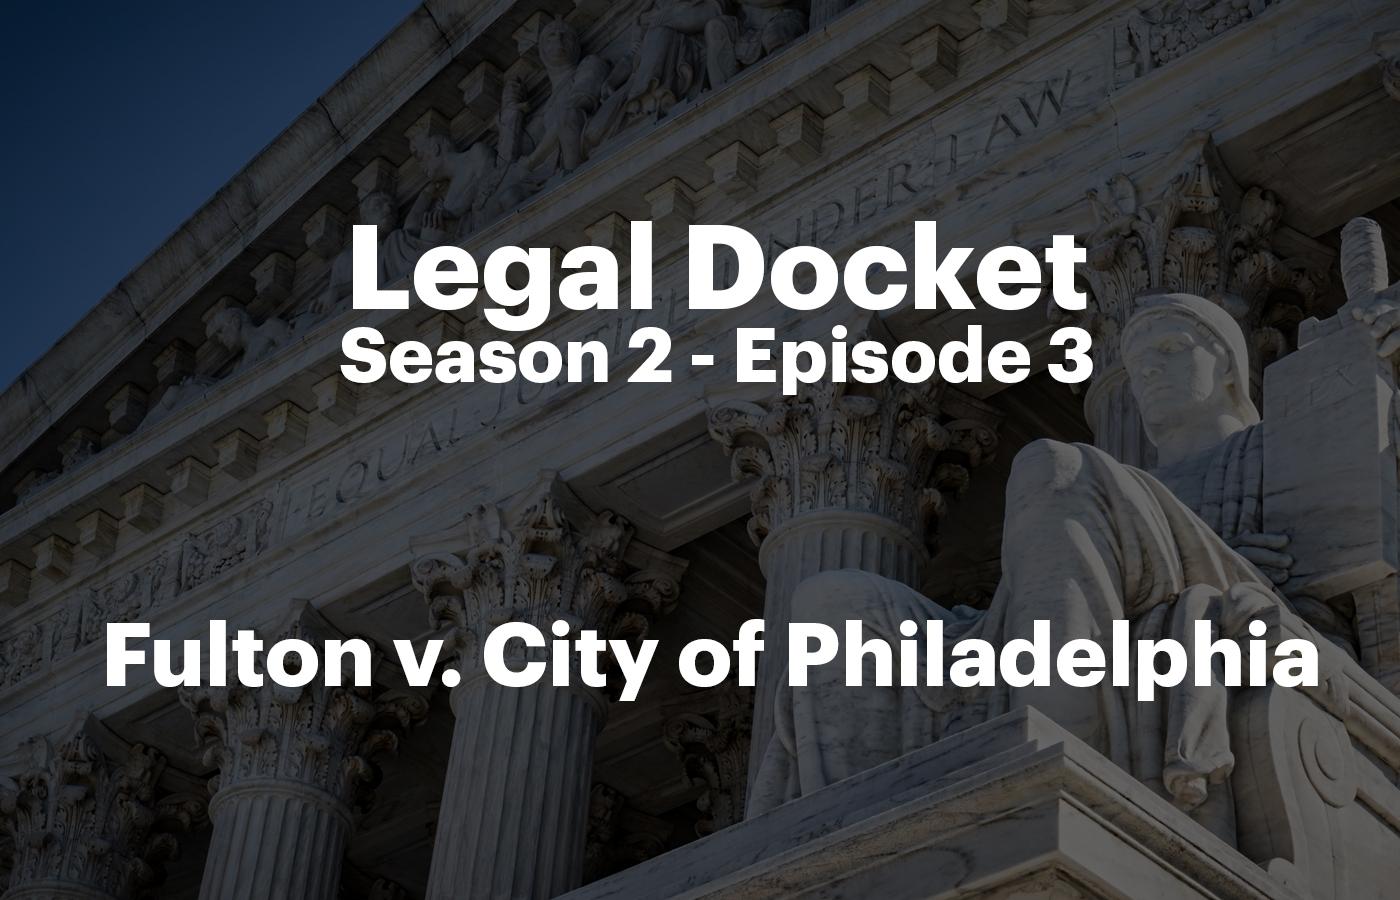 Legal Docket S2 E3